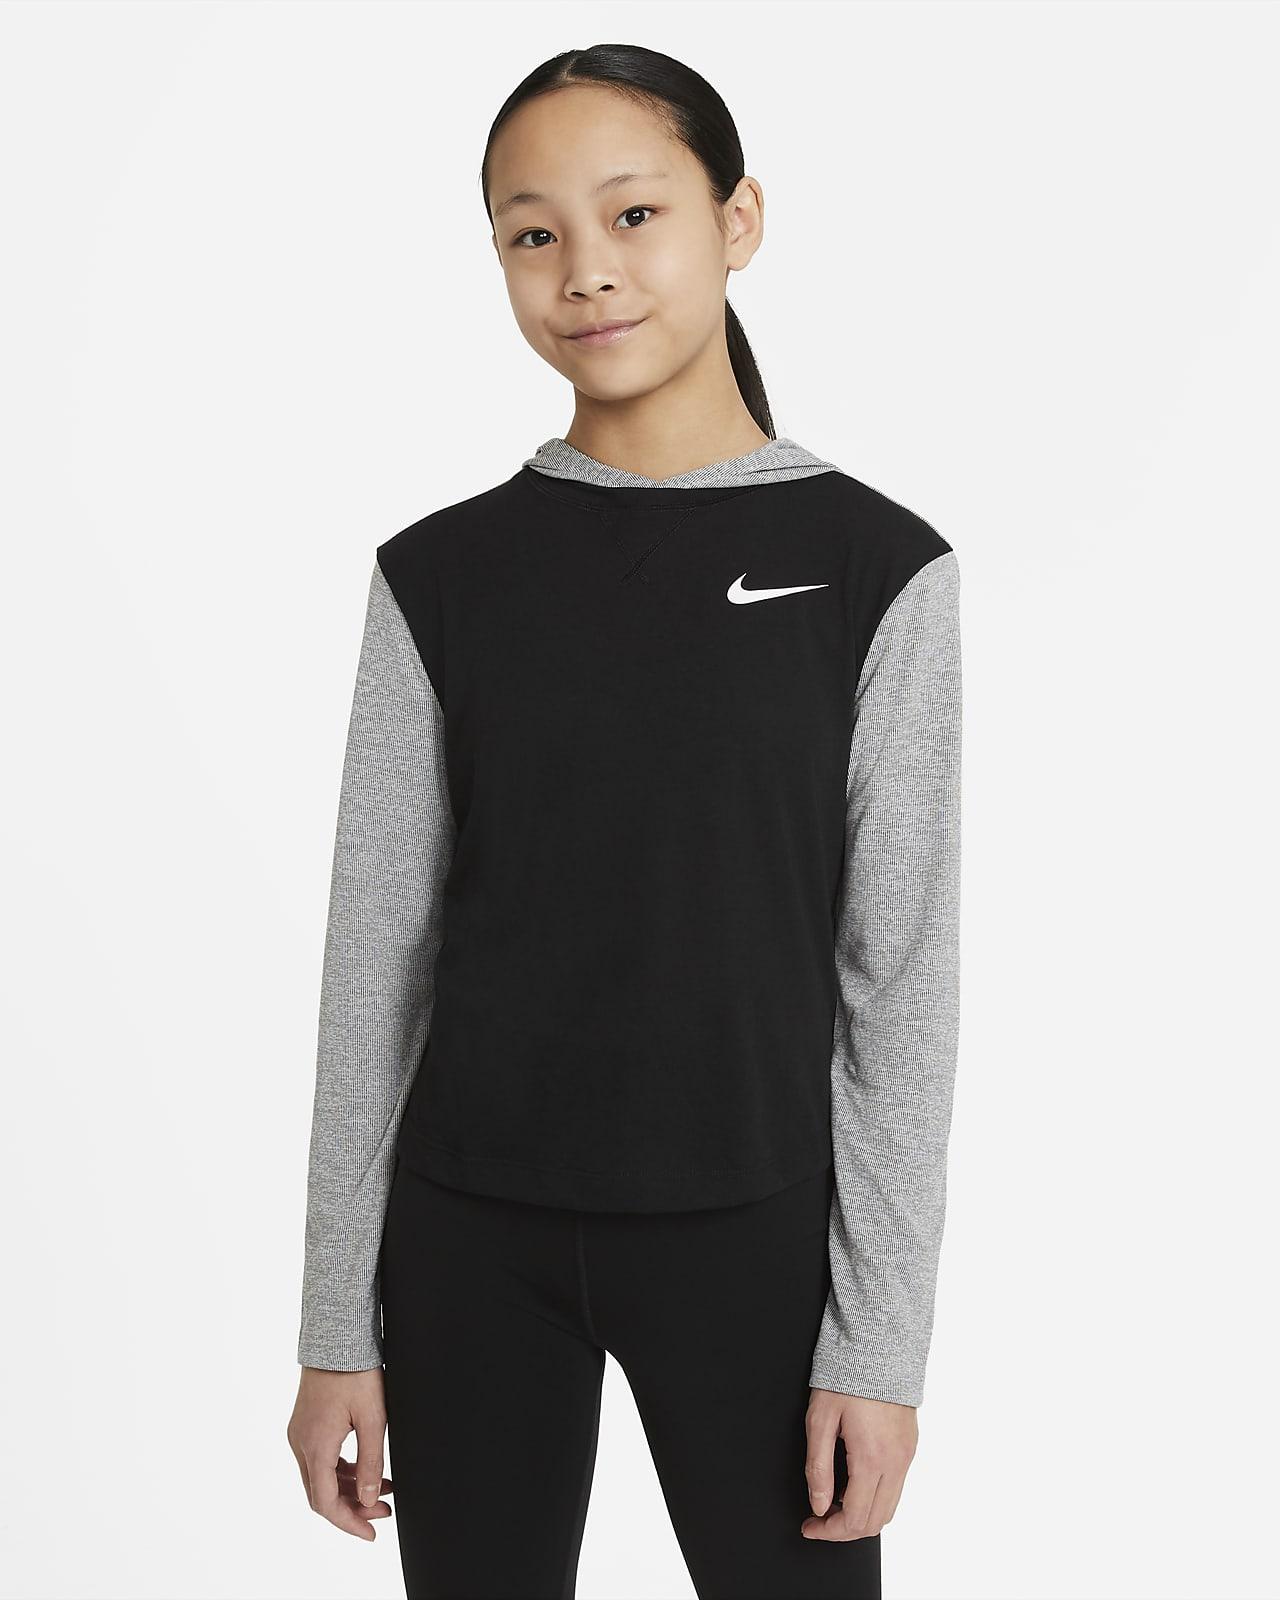 Sudadera de manga larga con capucha para niñas talla grande Nike Dri-FIT Trophy